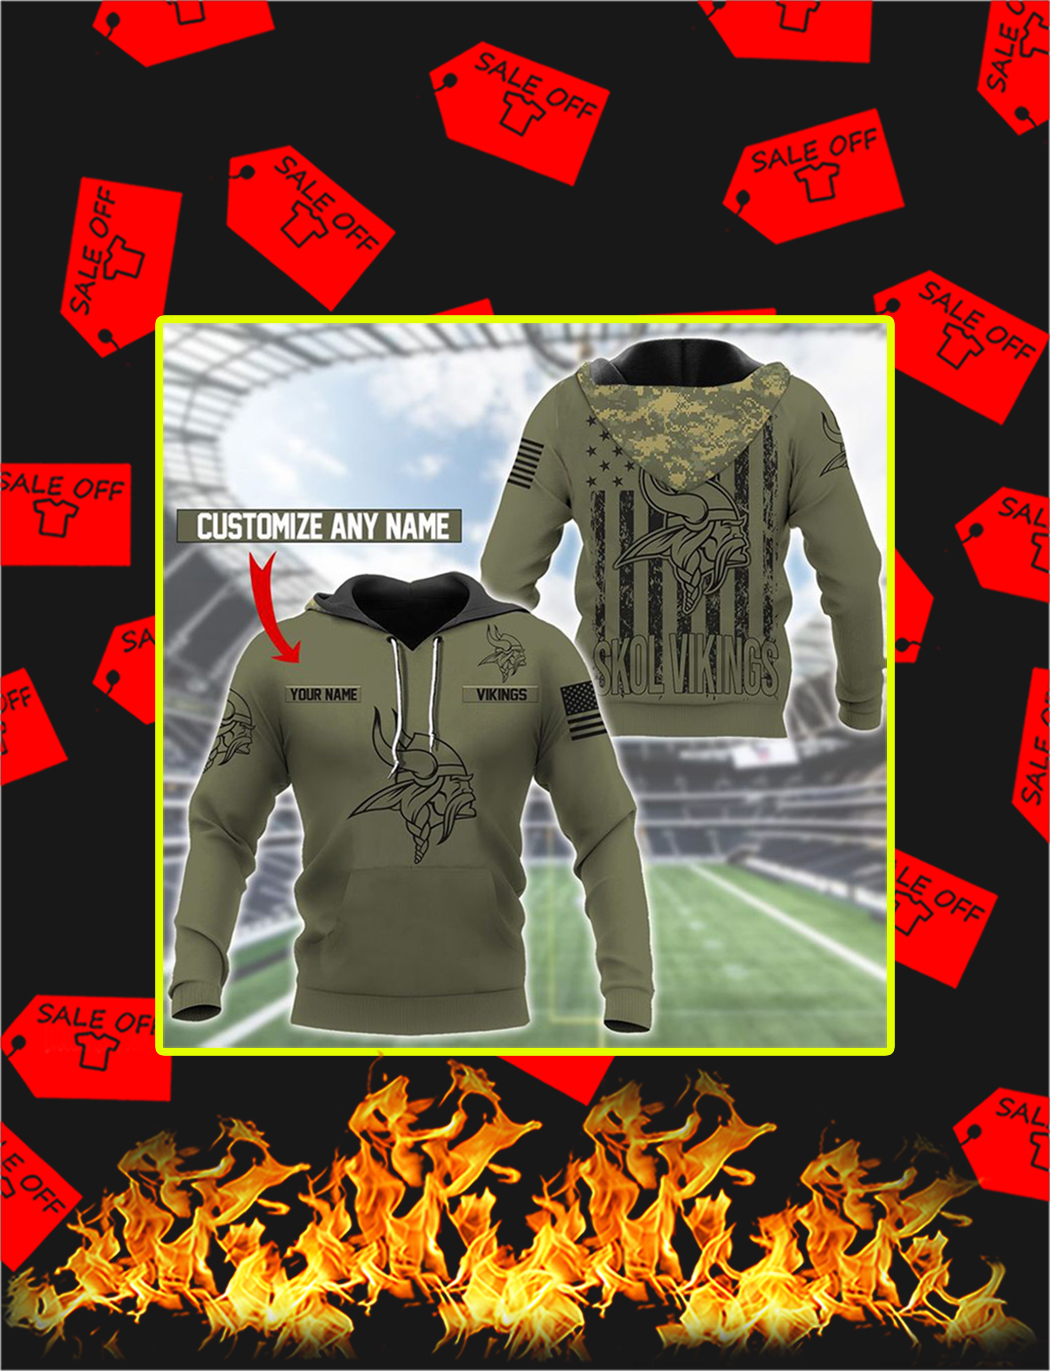 Minnesota Vikings Custom Name Personalize Hoodie - M